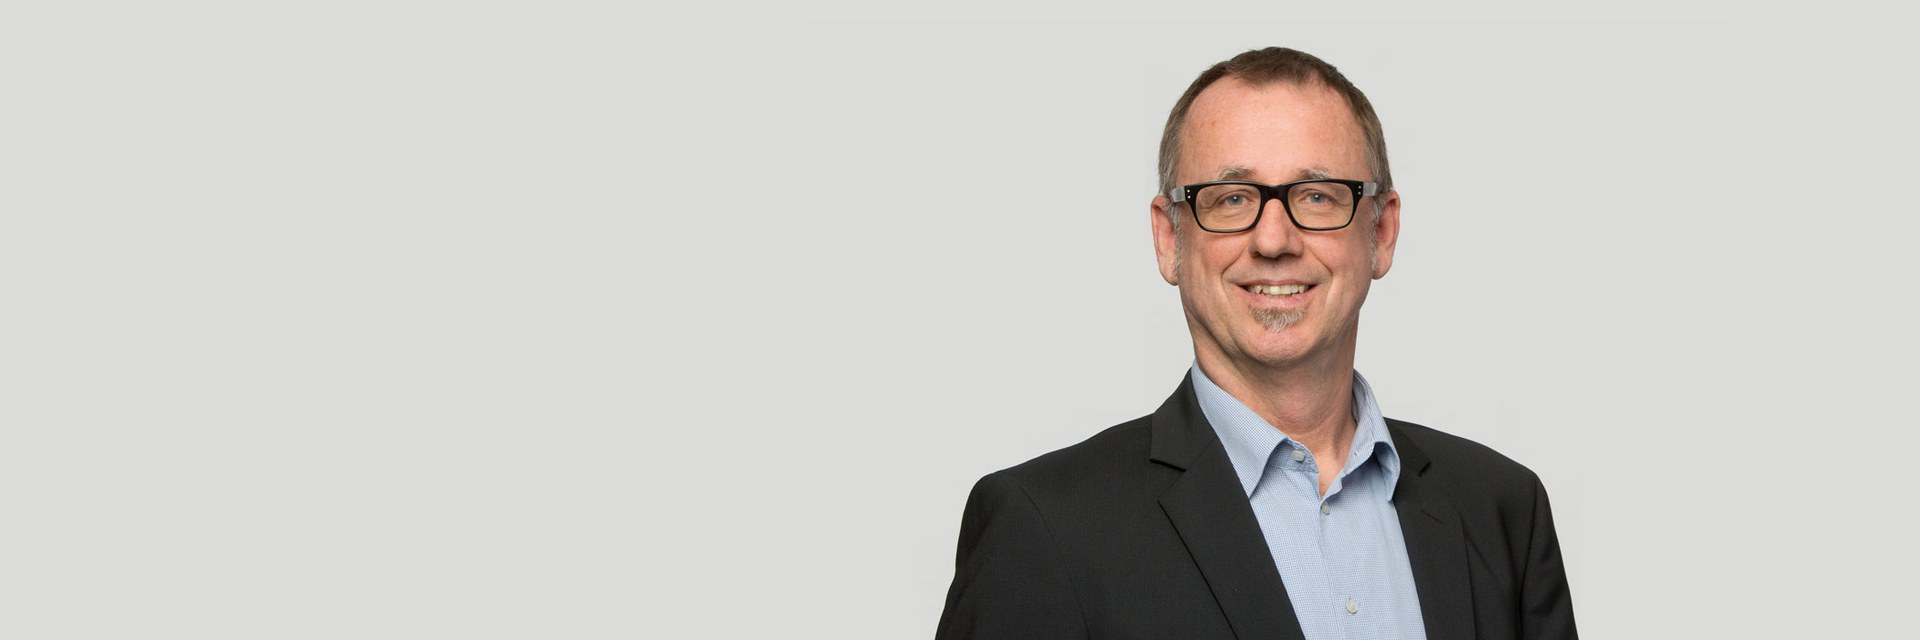 Prof. Dr. Christoph Minnig